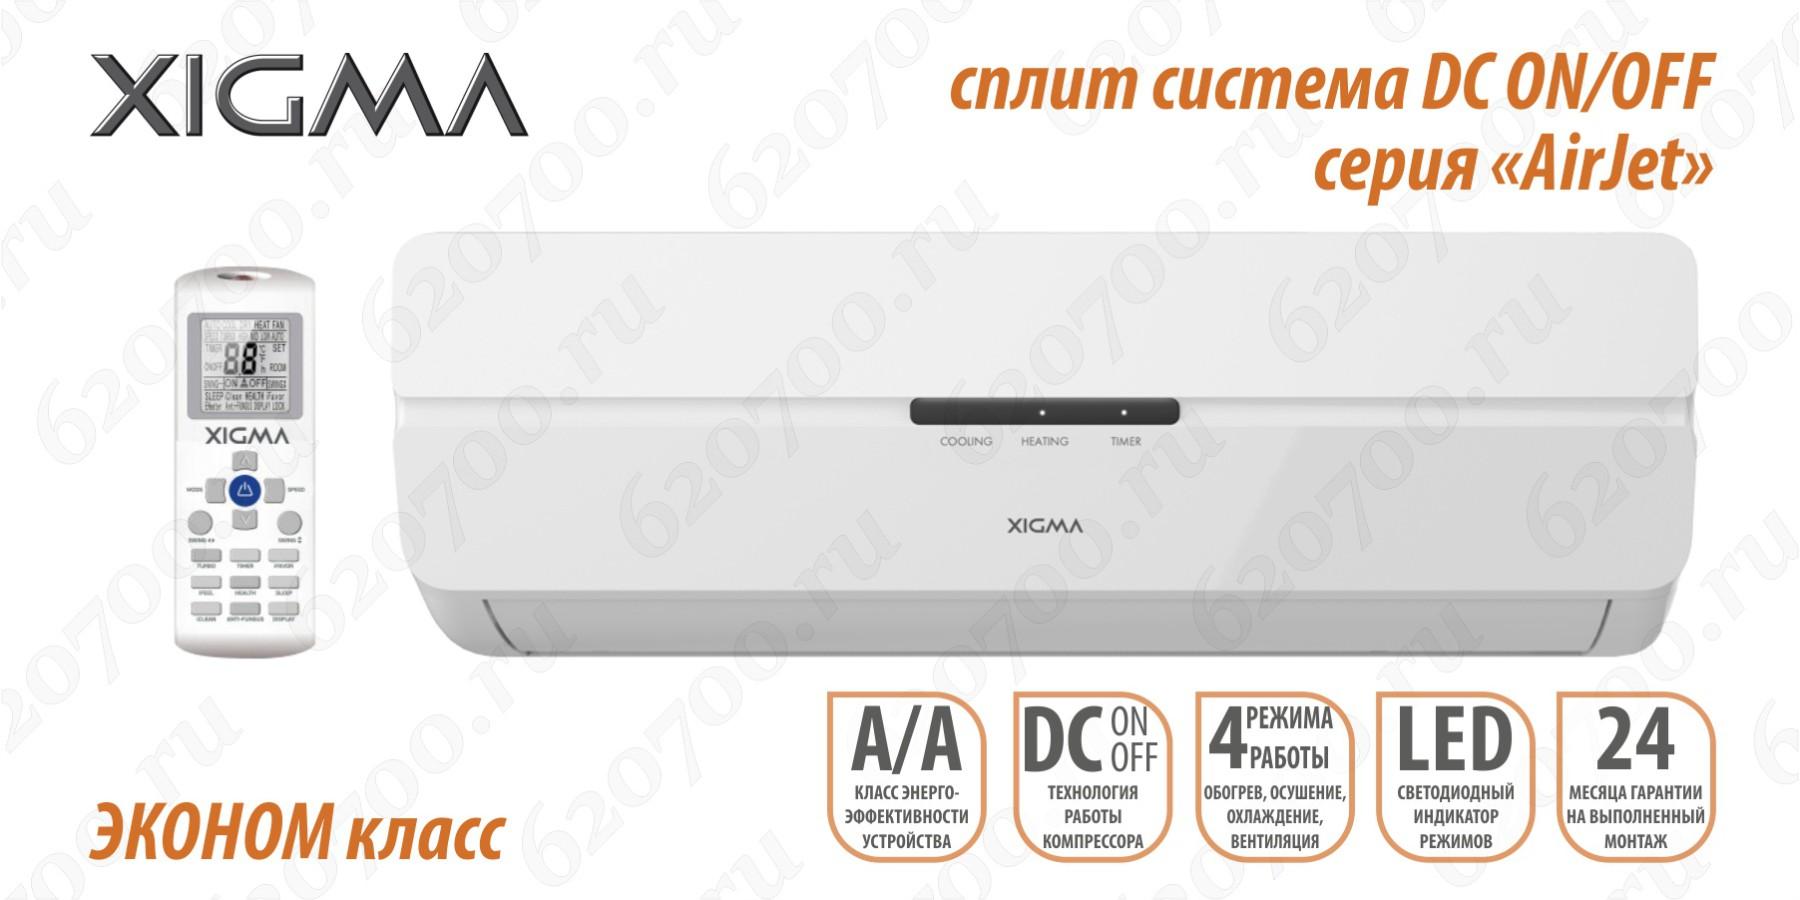 Кондиционер XIGMA XG-AJ28RHA-IDU/ ODU